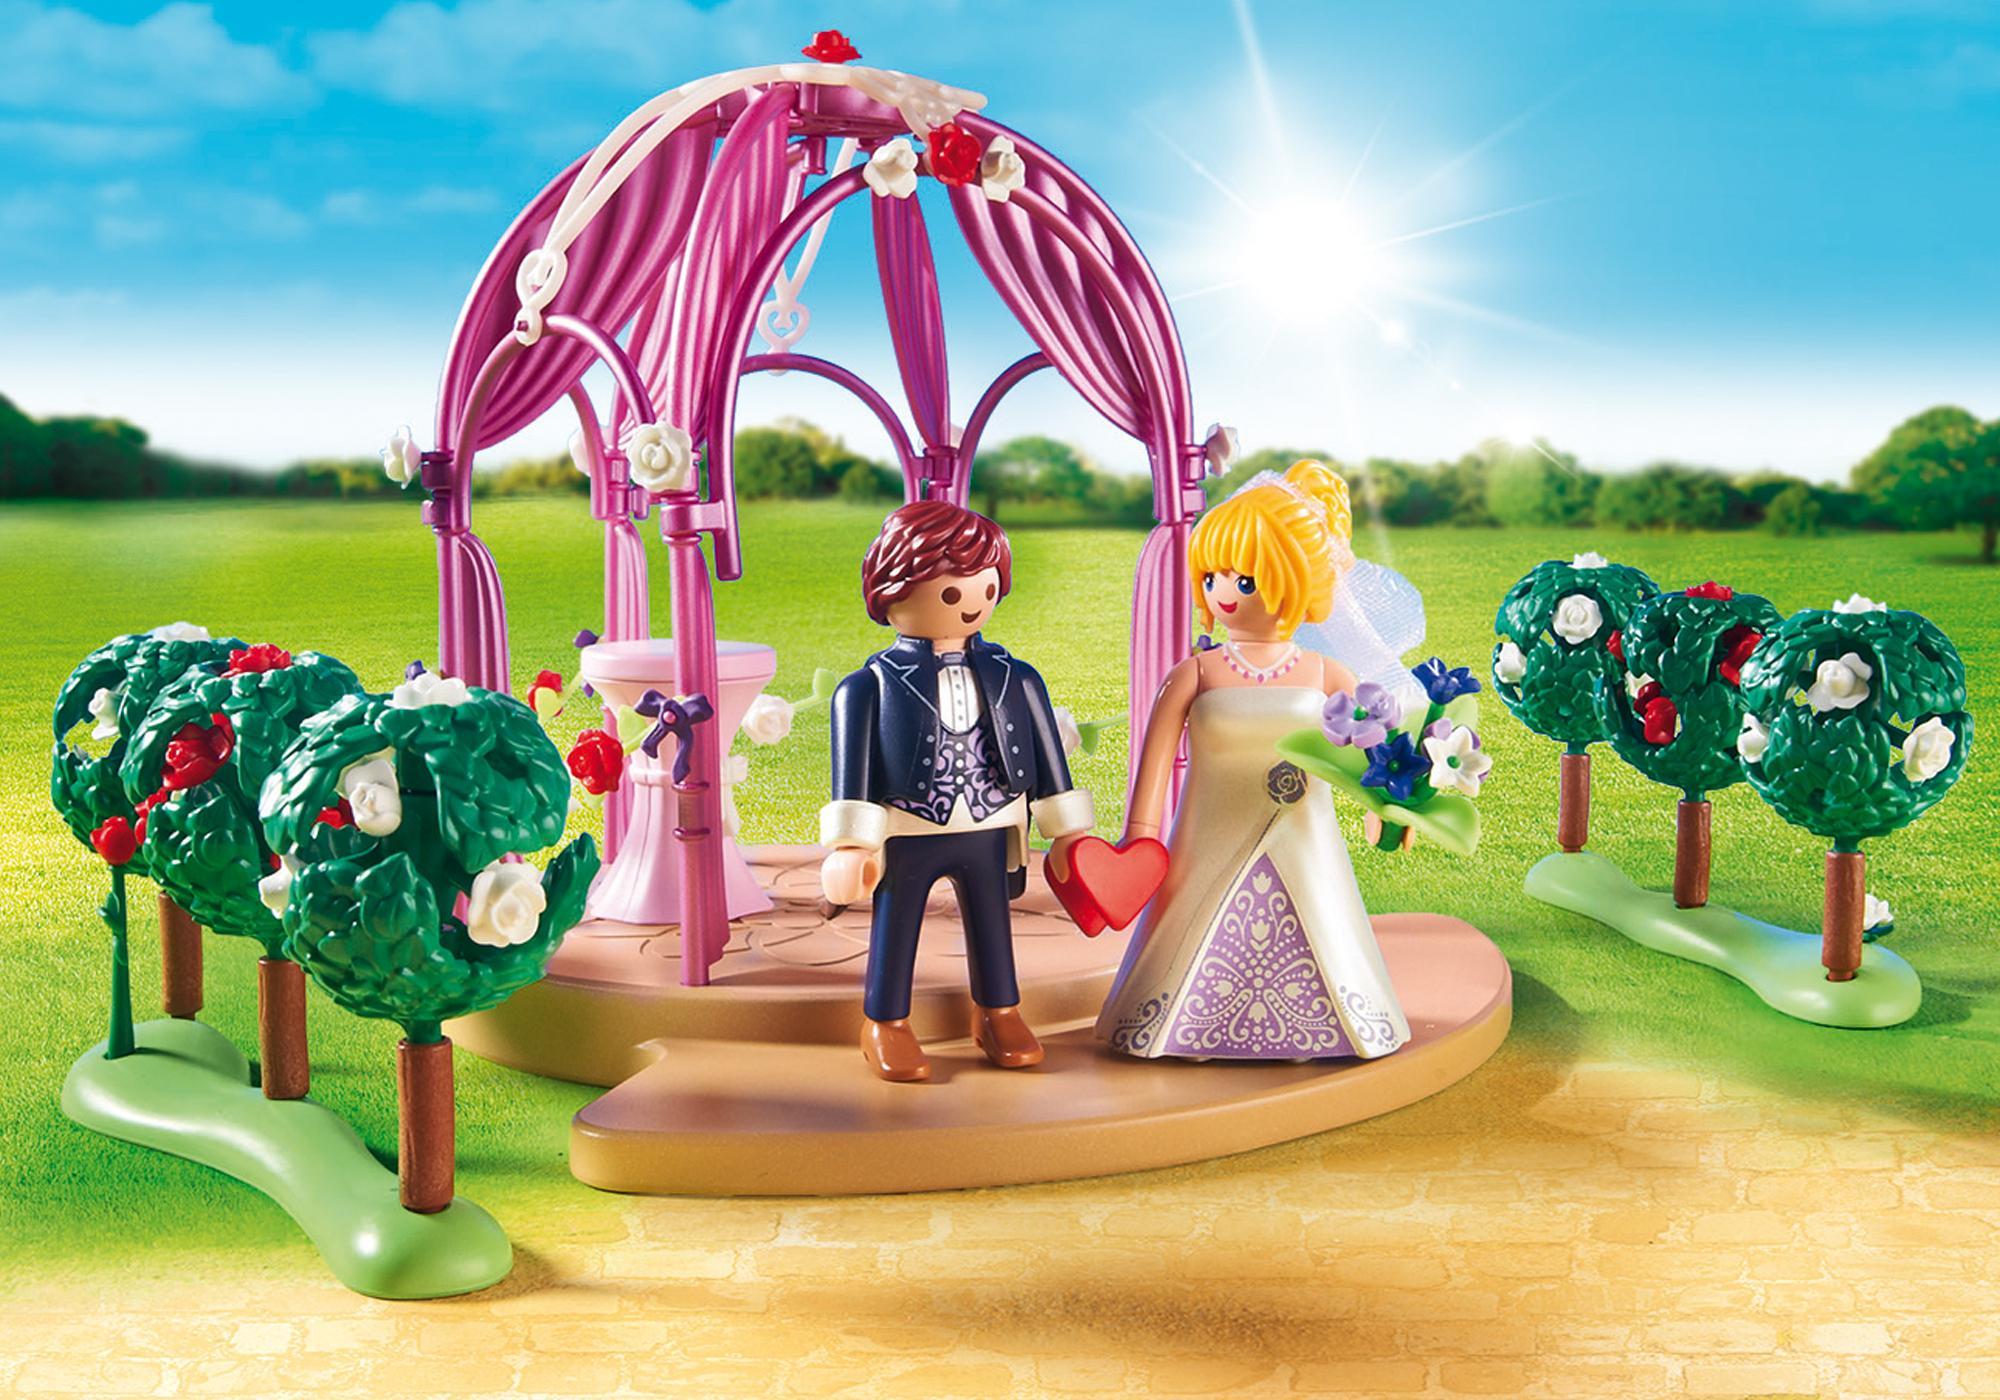 http://media.playmobil.com/i/playmobil/9229_product_extra1/Pavillon de mariage